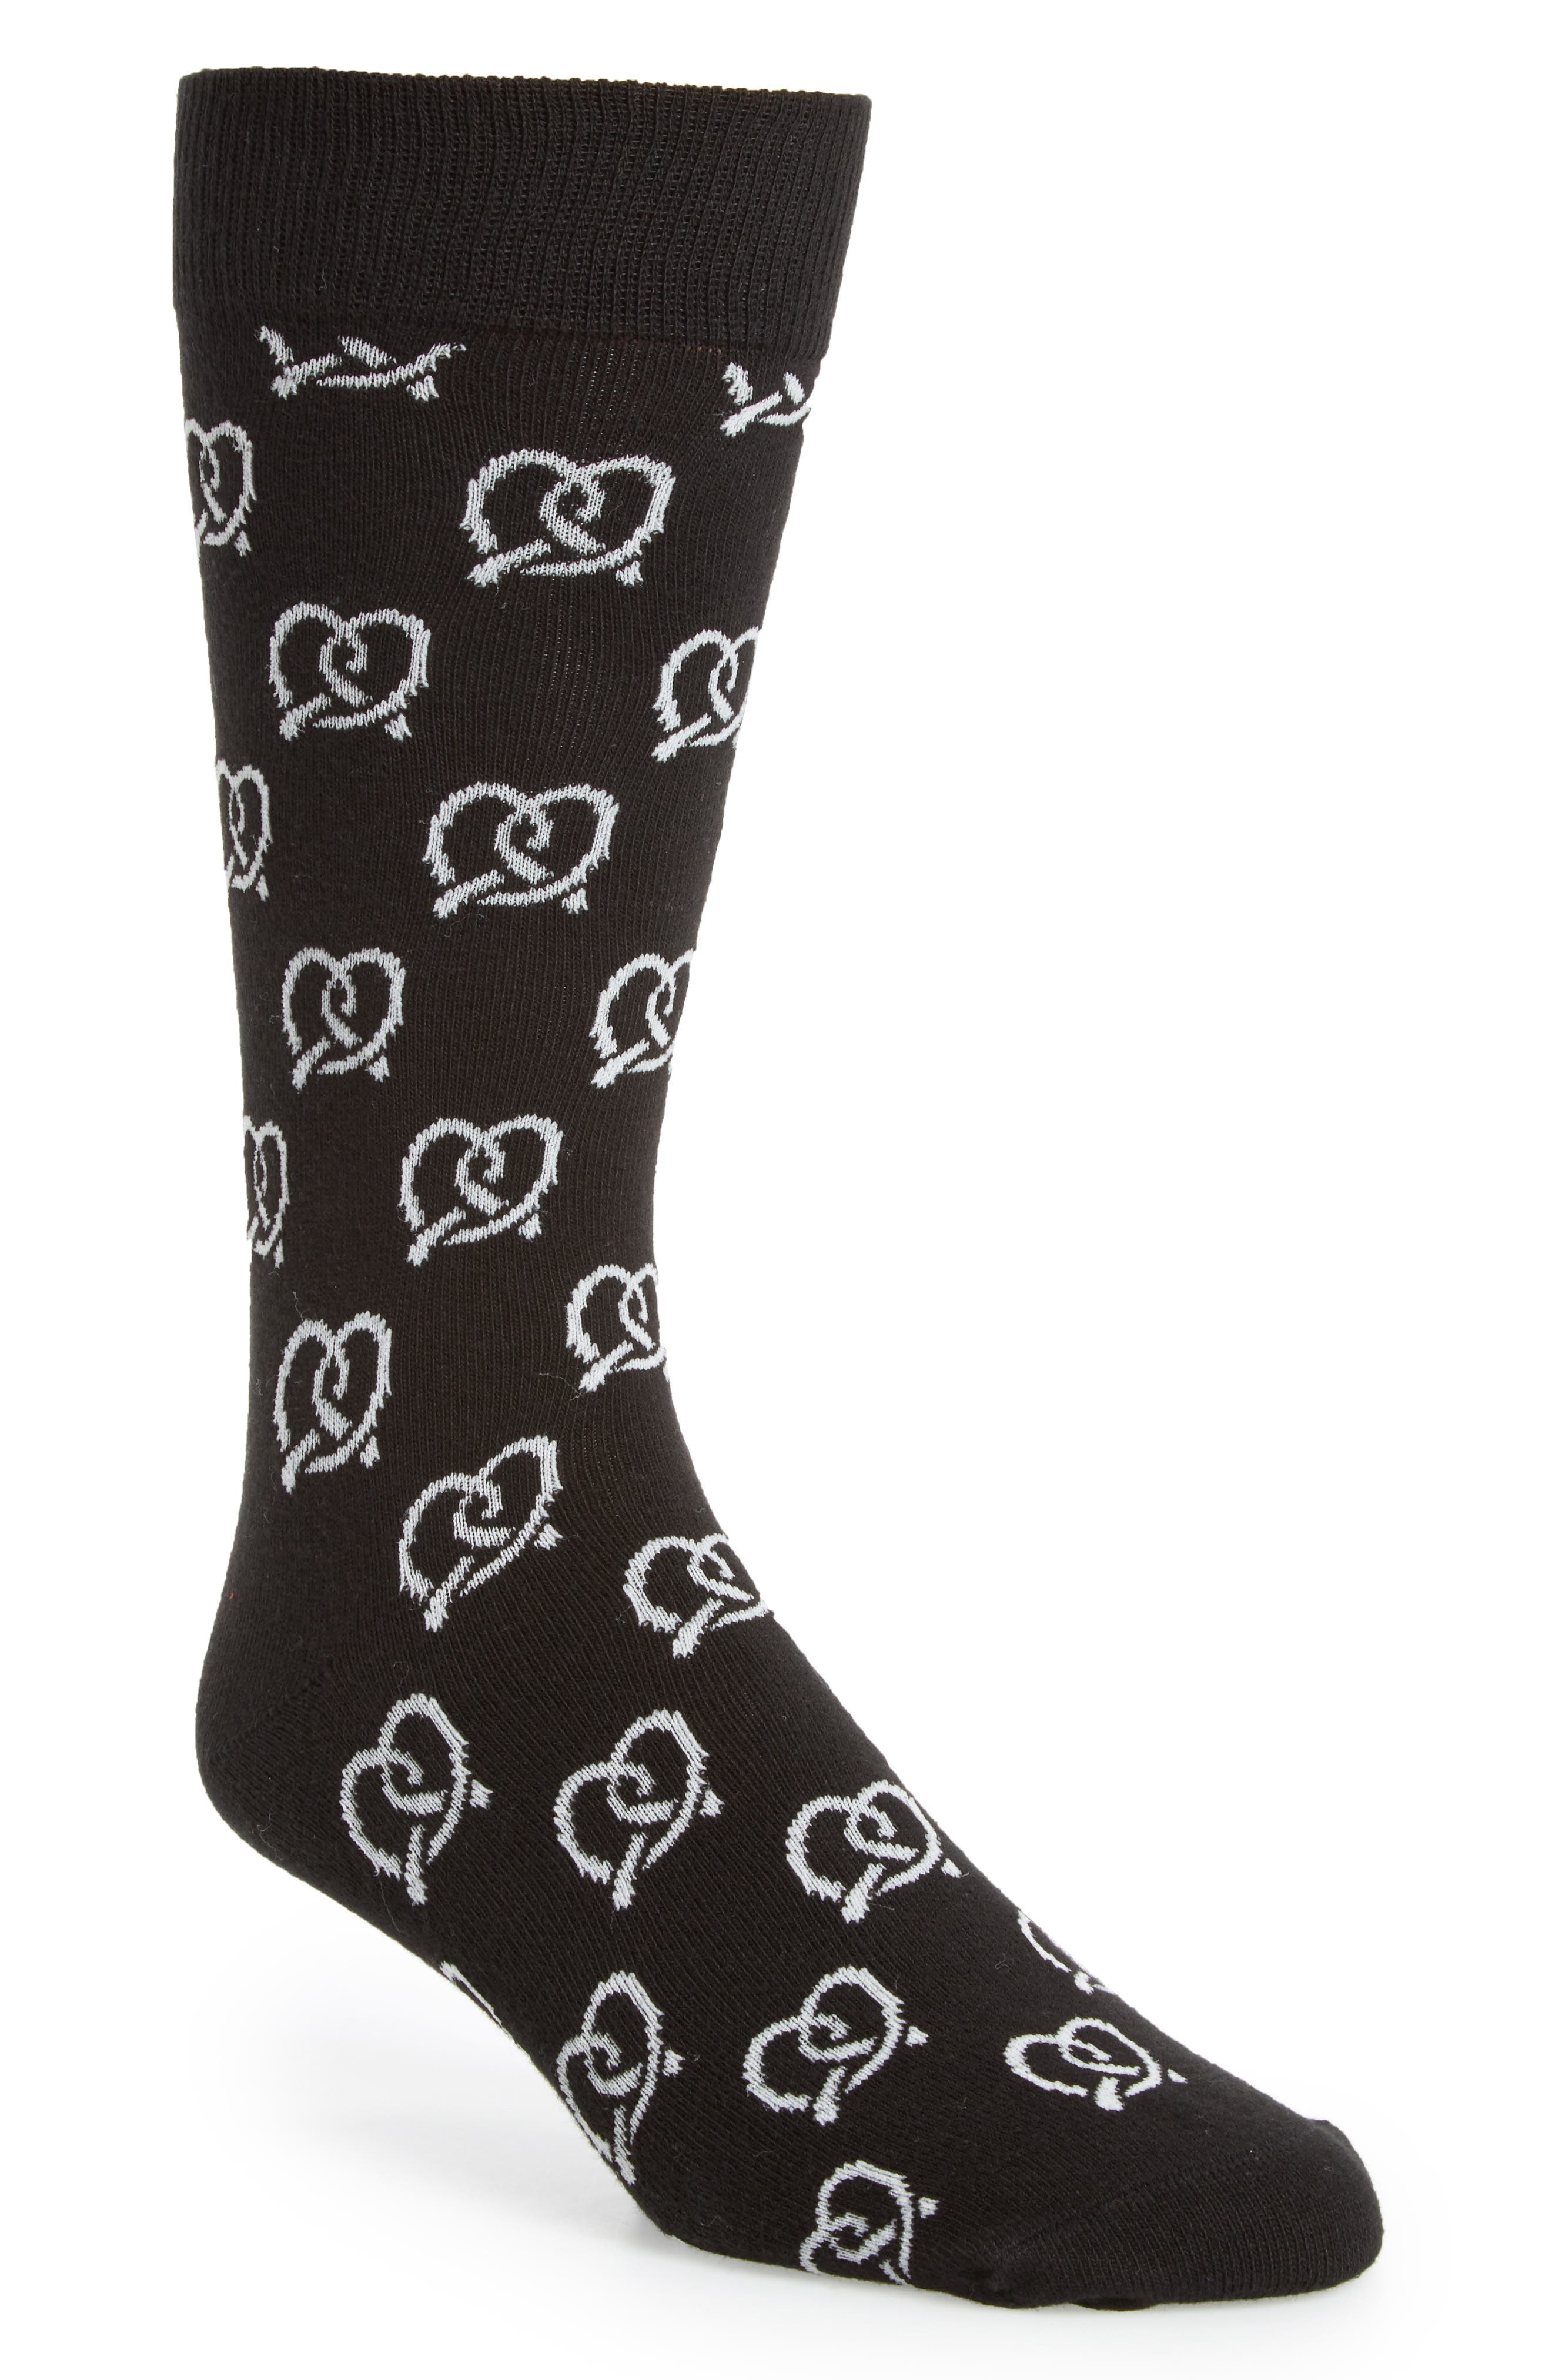 Pretzel Socks,                         Main,                         color, Black/ White